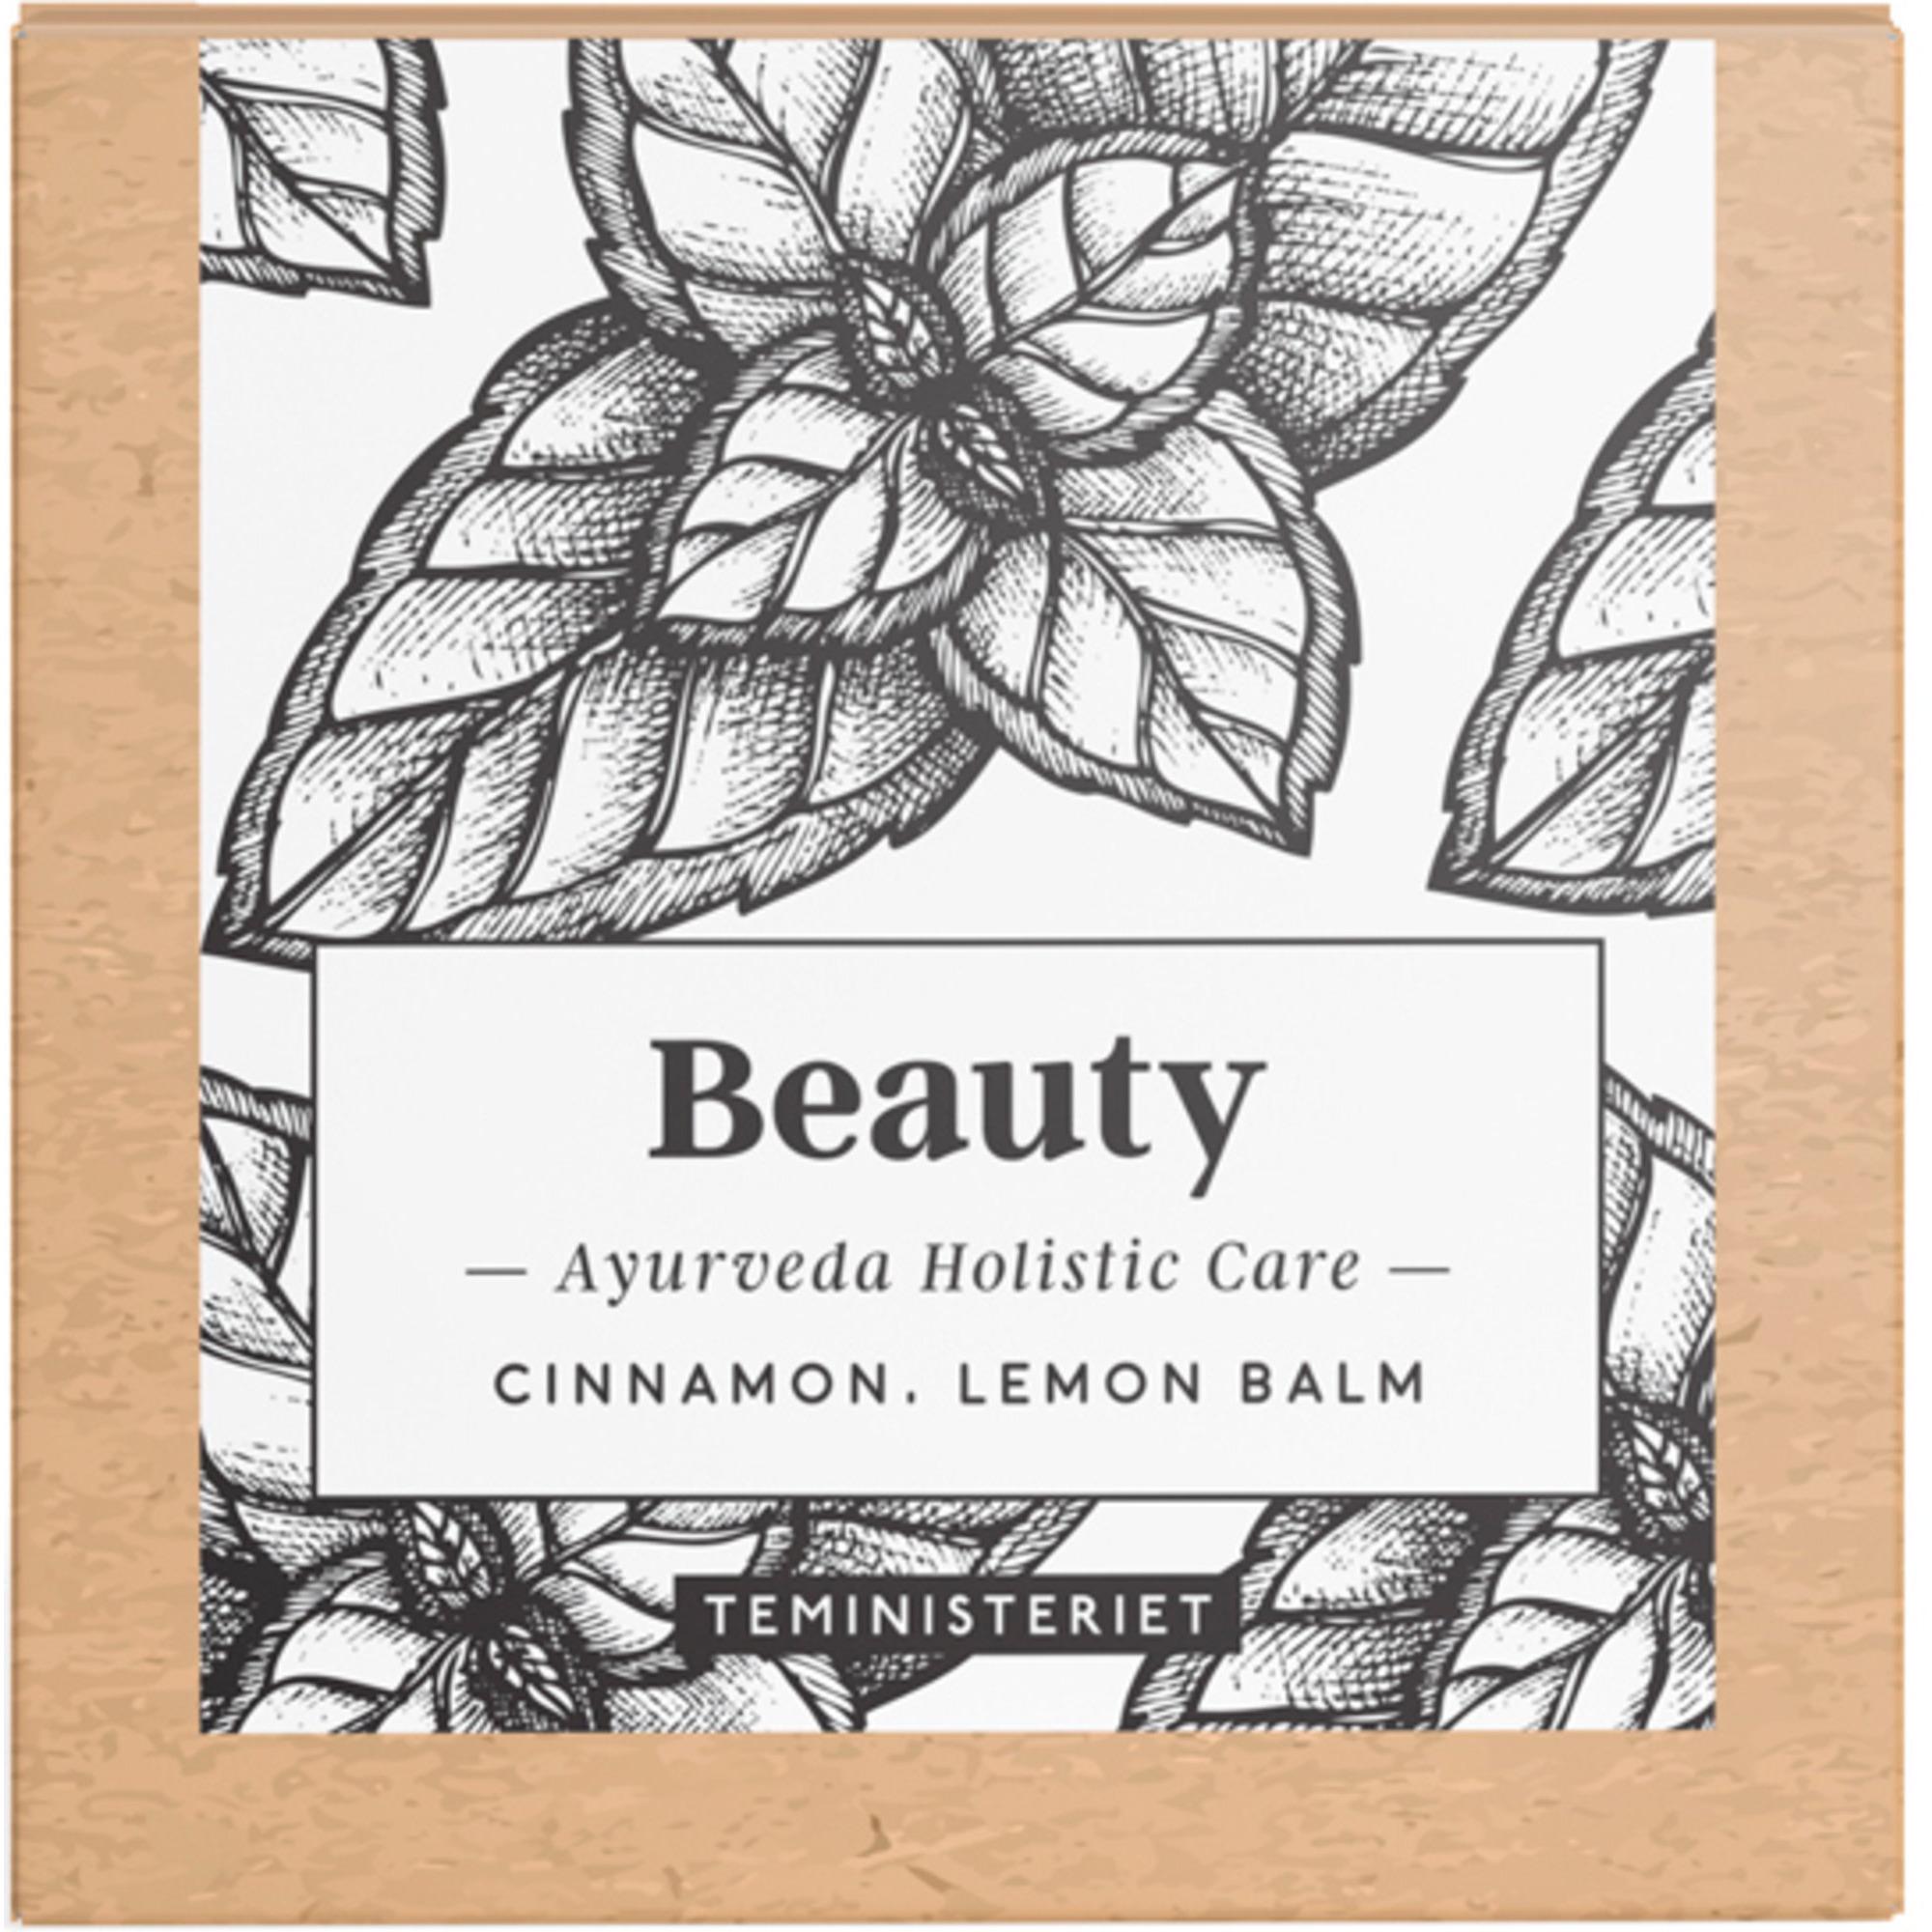 Teministeriet Ayurveda Beauty tepåsar 100 g.